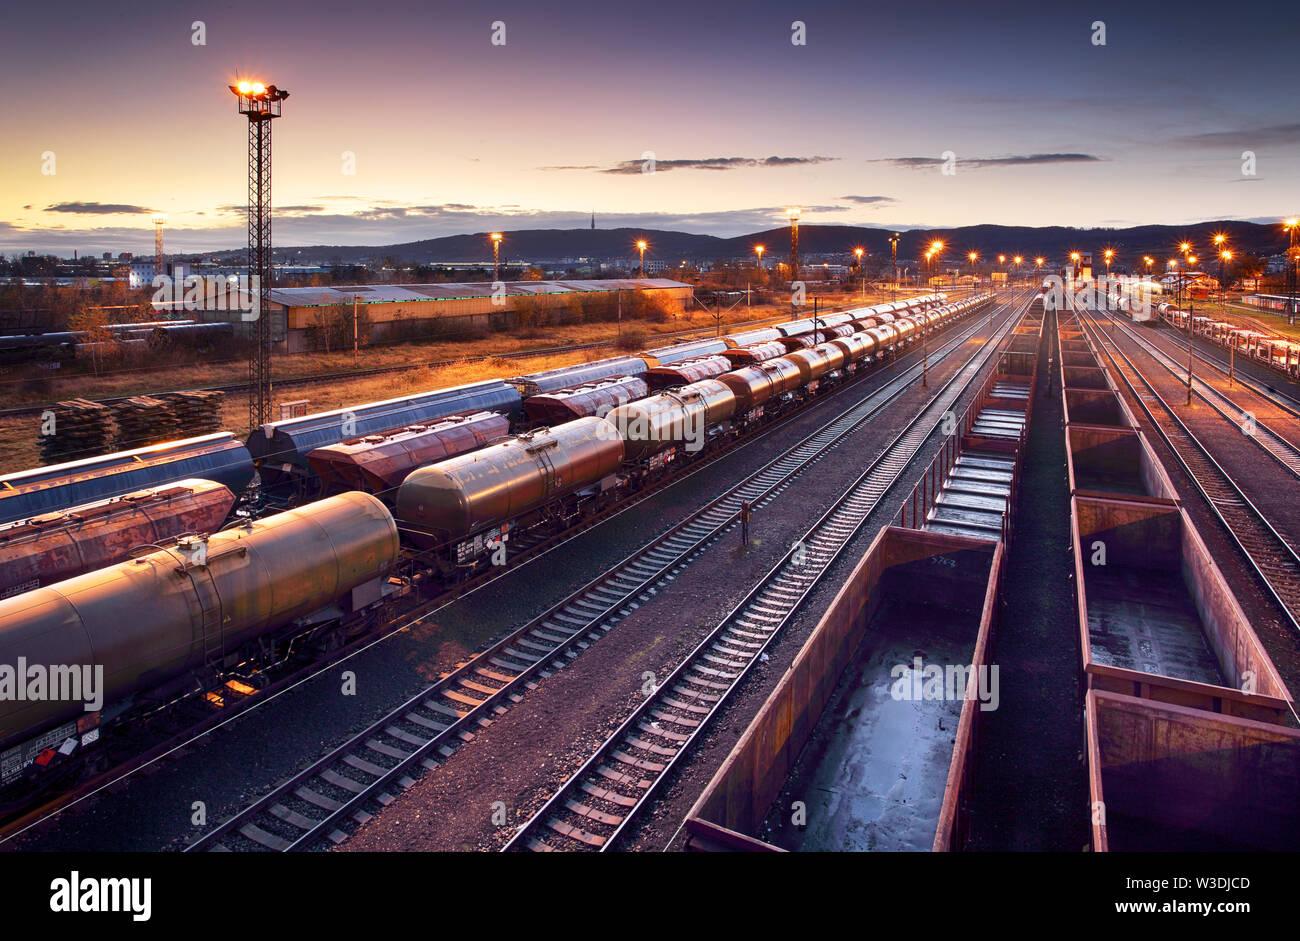 Railway station freight trains, Cargo transport - Stock Image